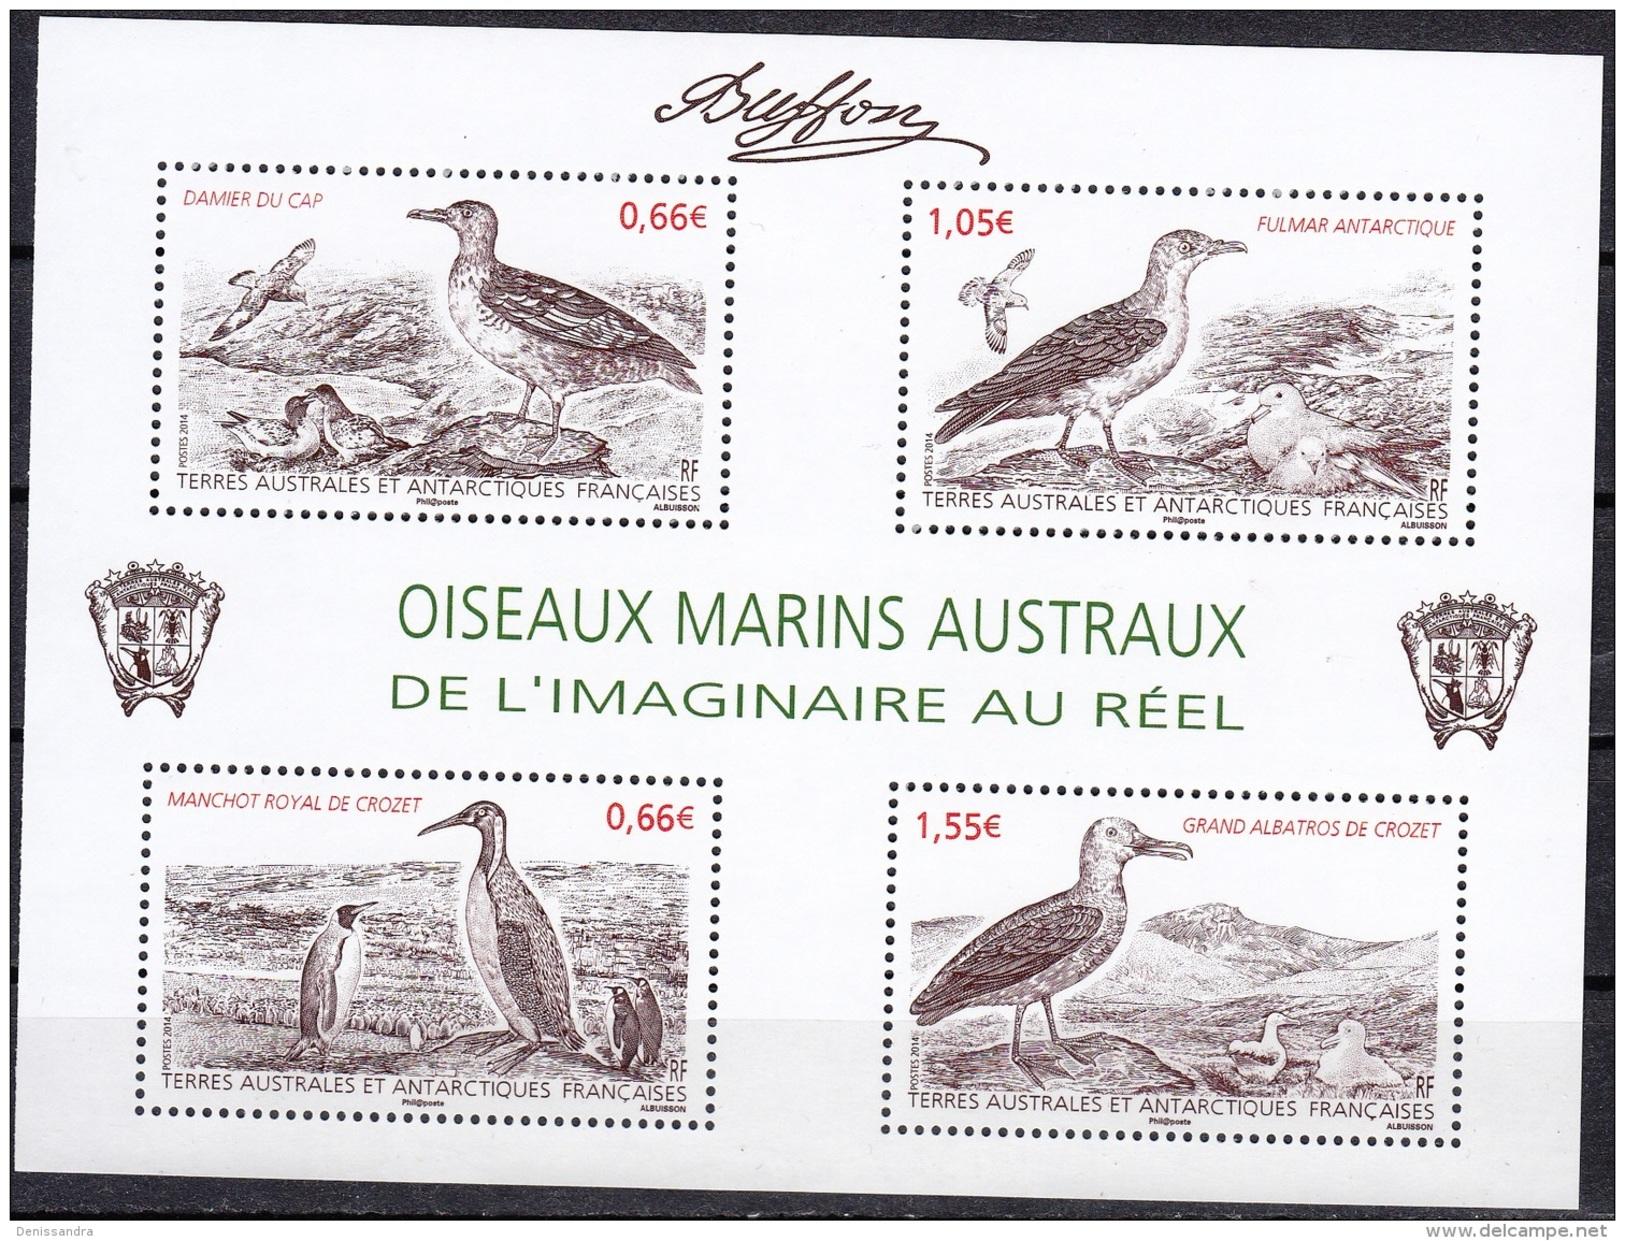 TAAF 2014 Yvert F693 Neuf ** Cote (2015) 8.10 Euro Oiseaux Marins Austraux - Blocks & Kleinbögen